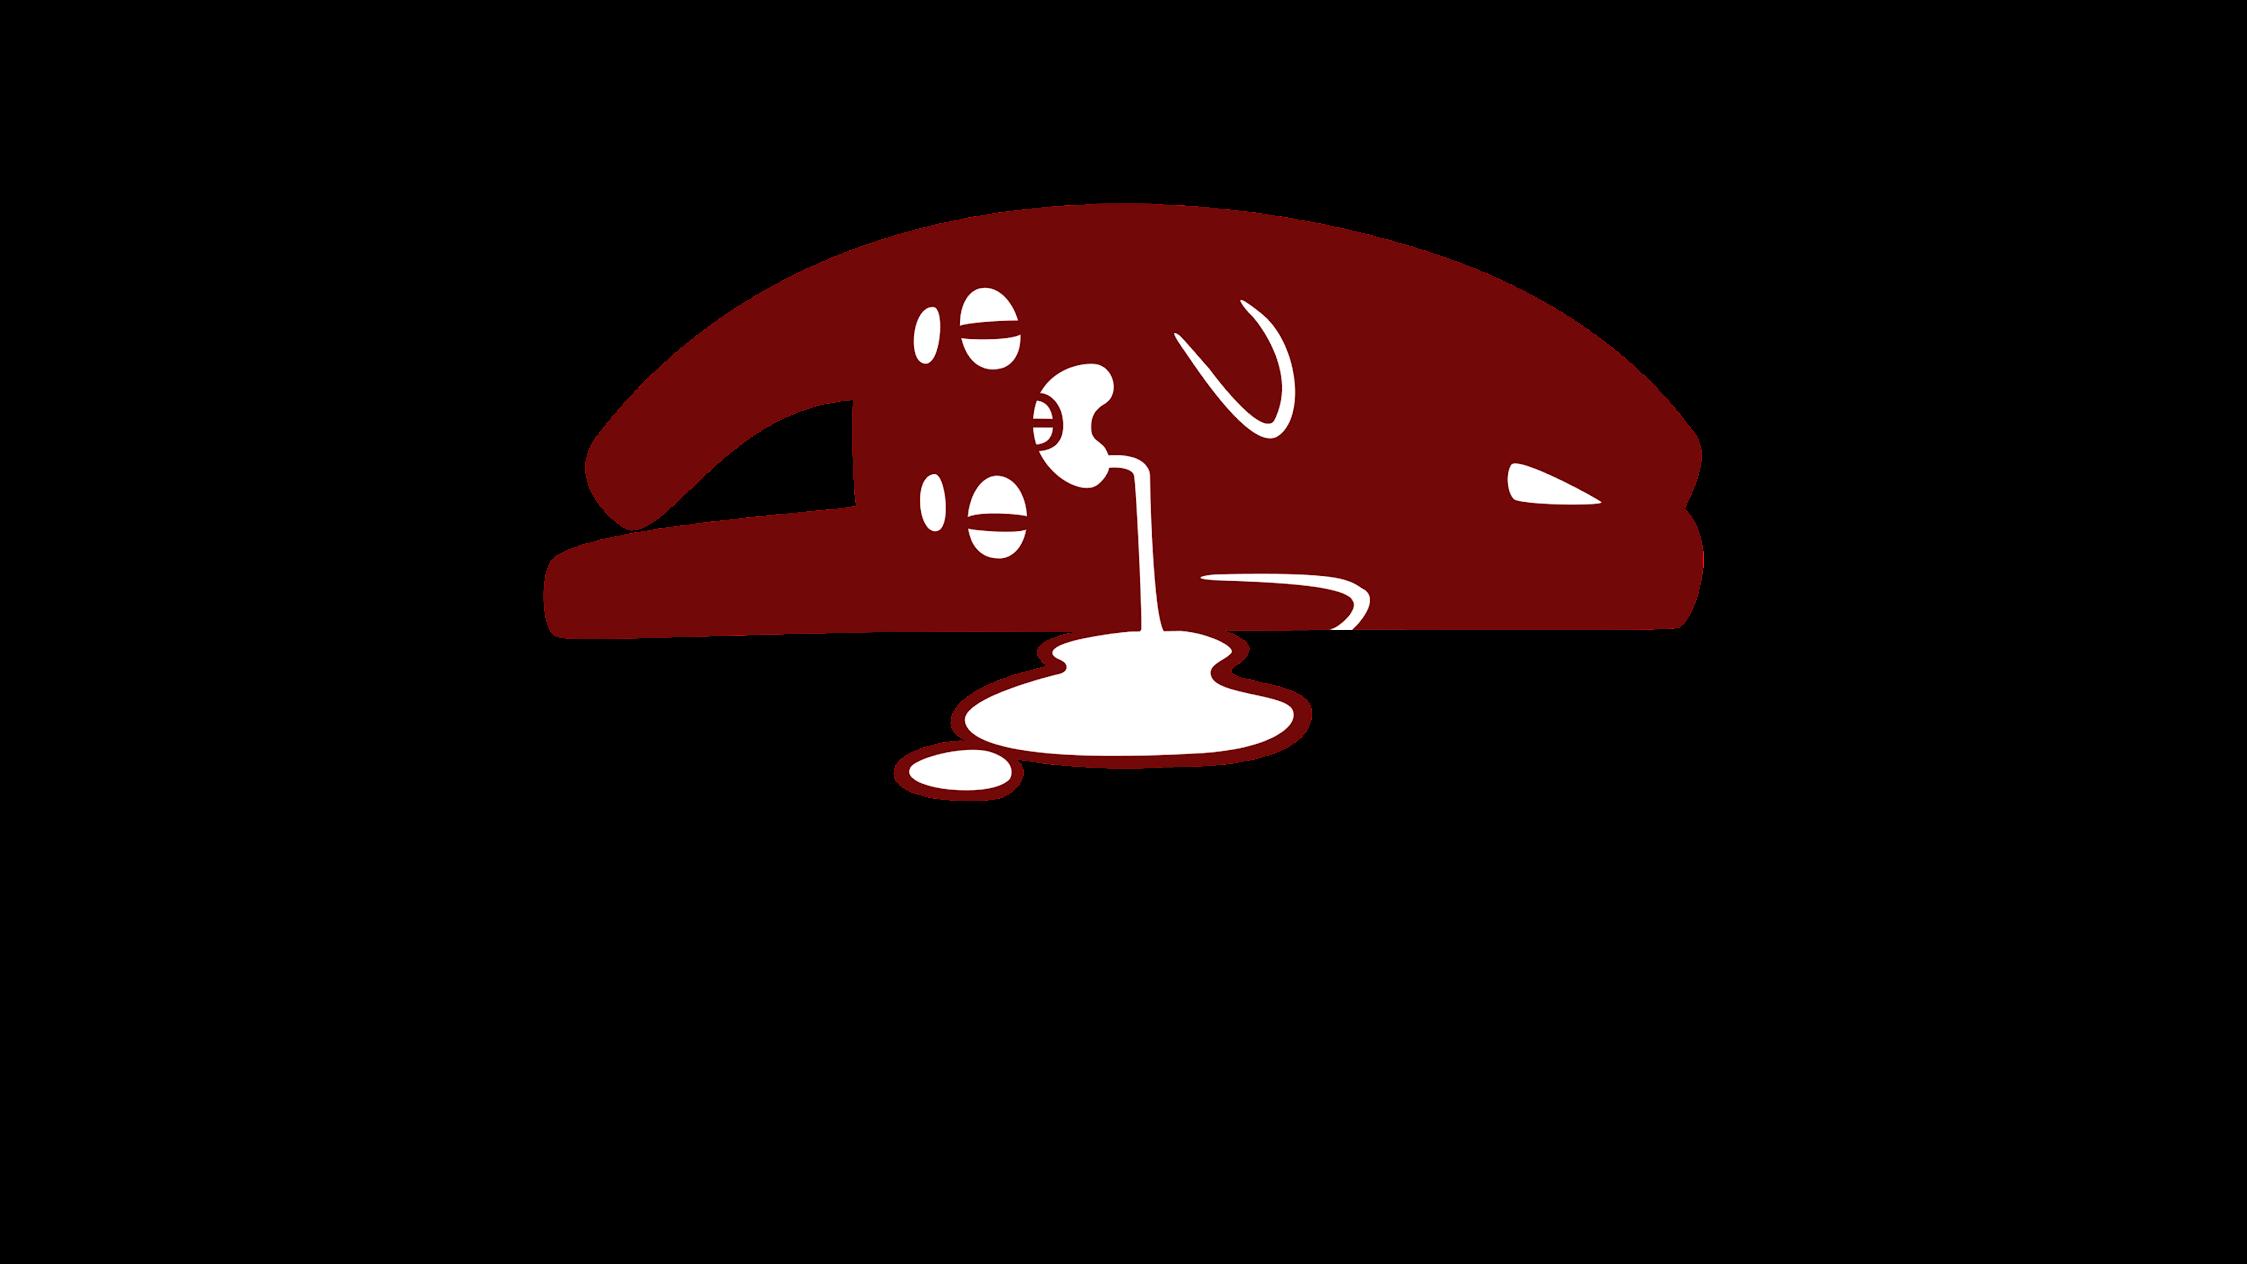 Pimentoso